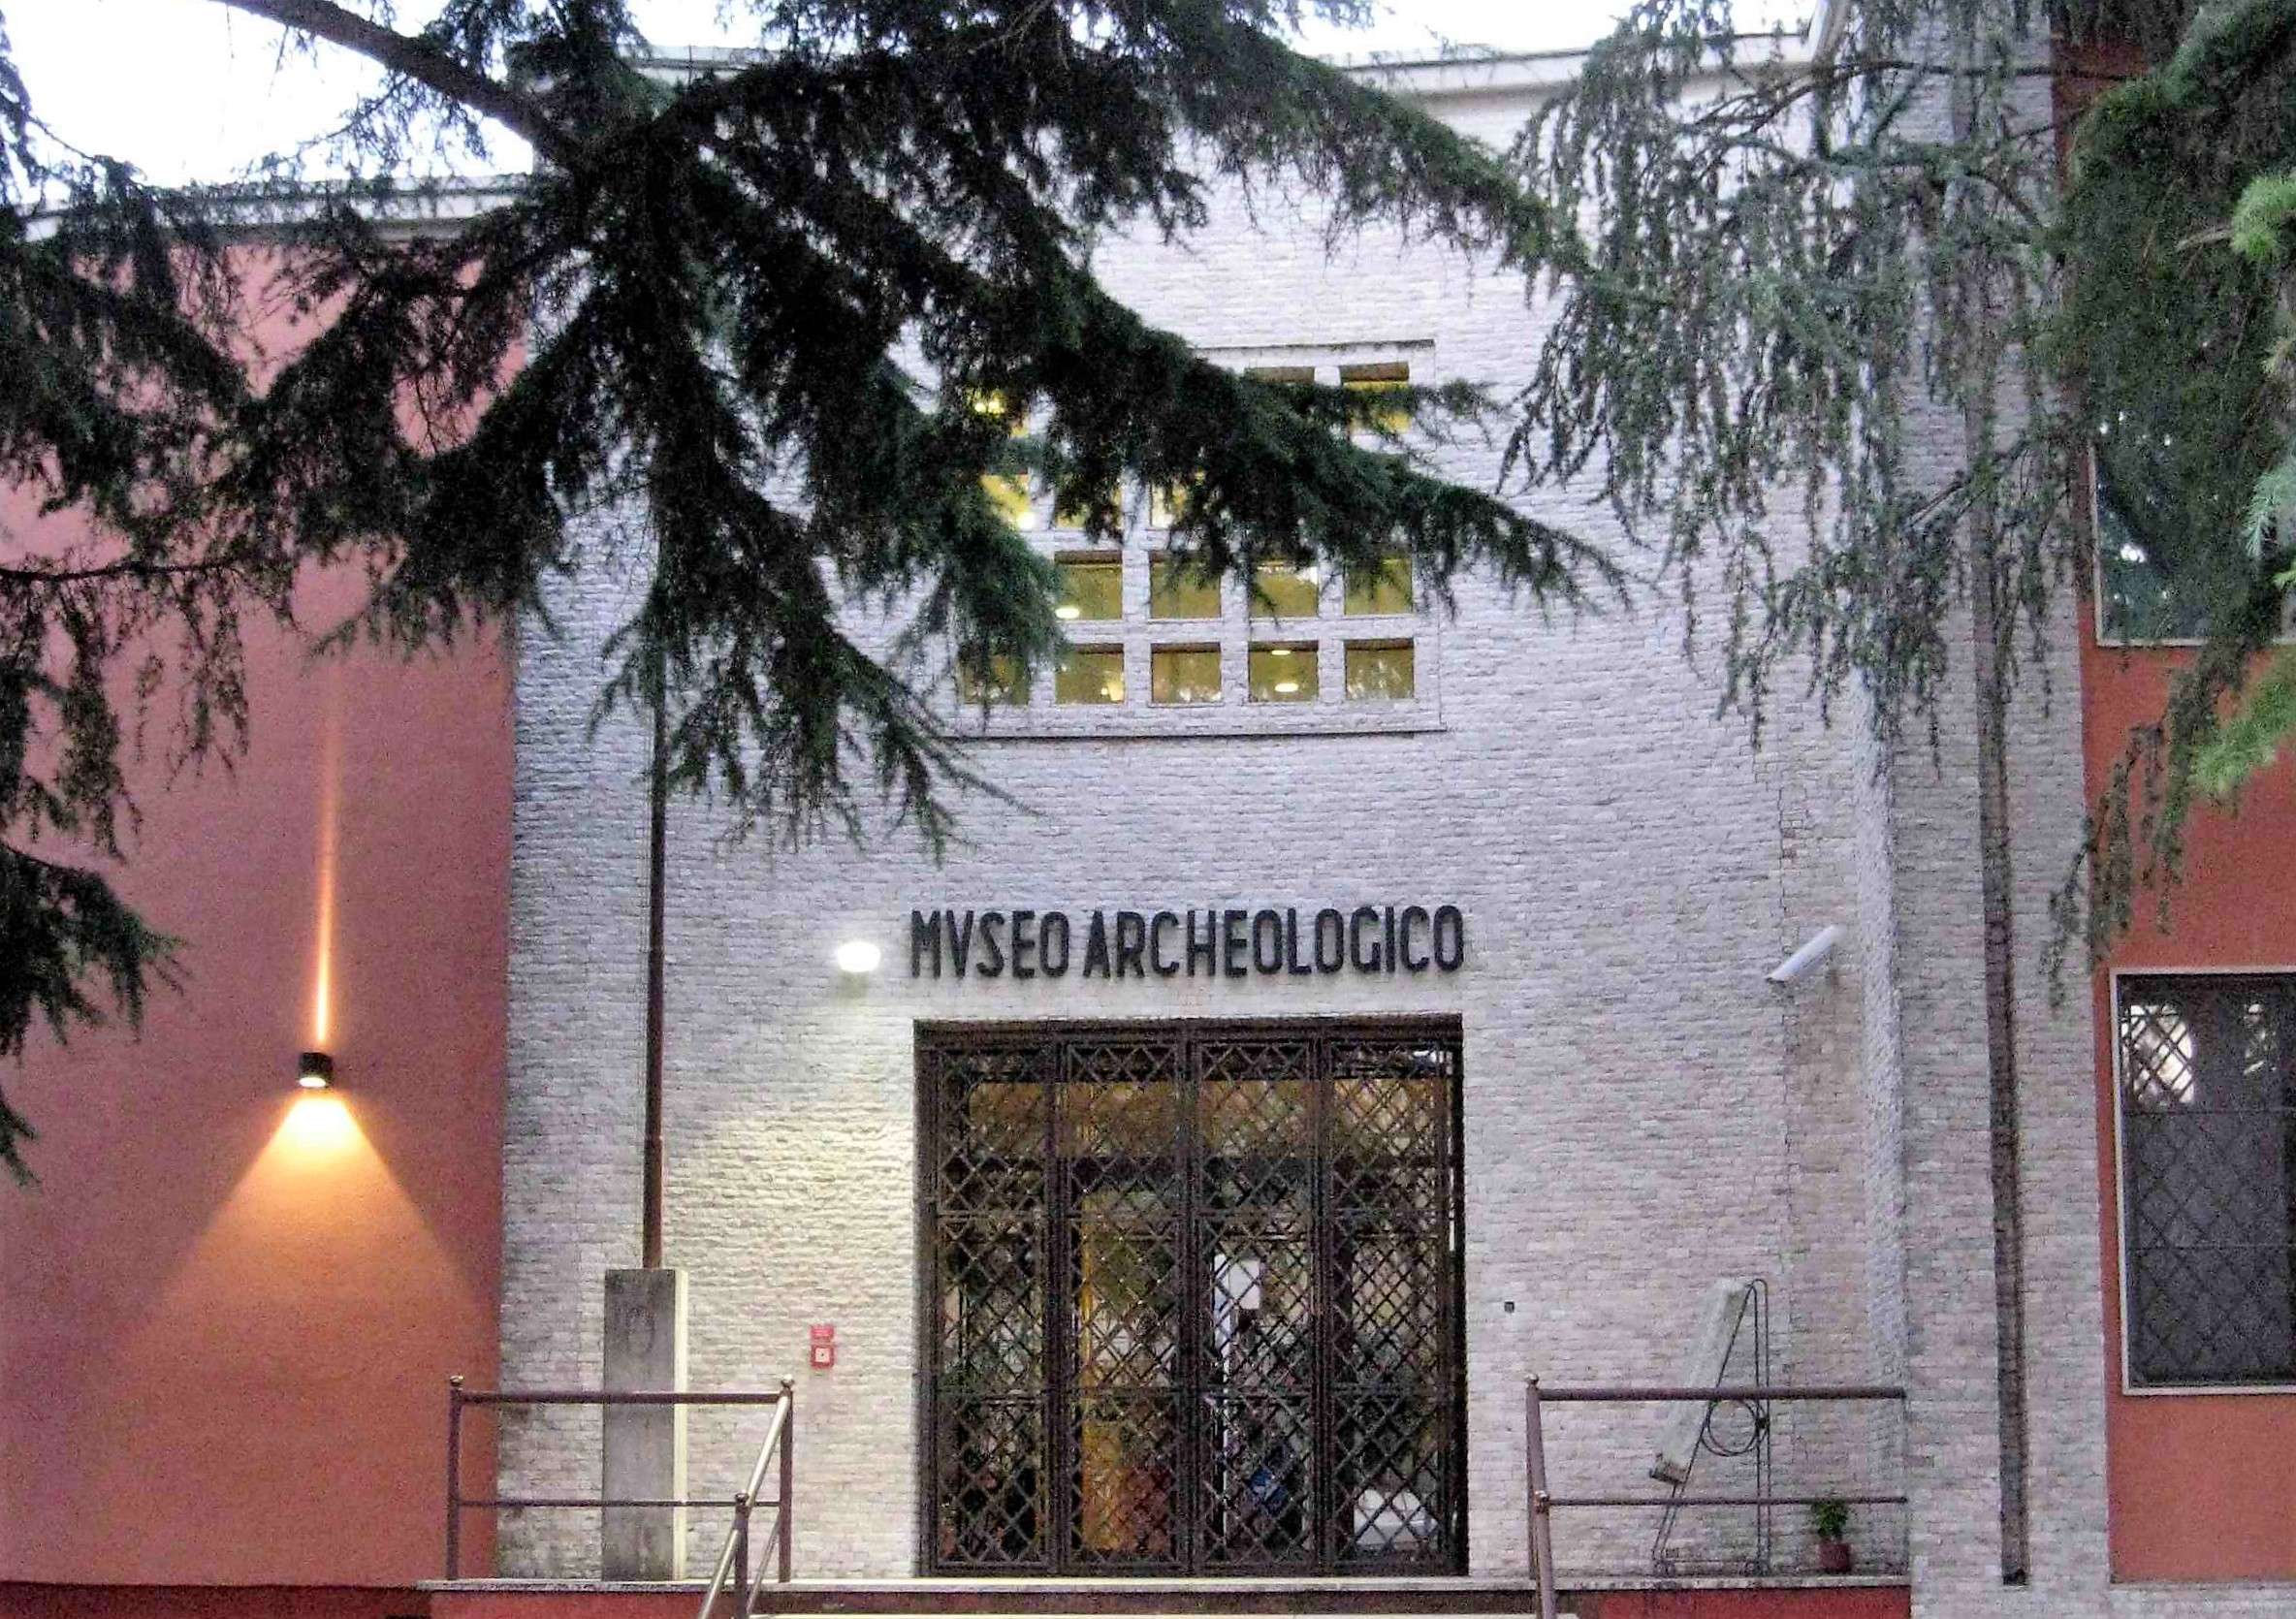 8 Museo Archeologico